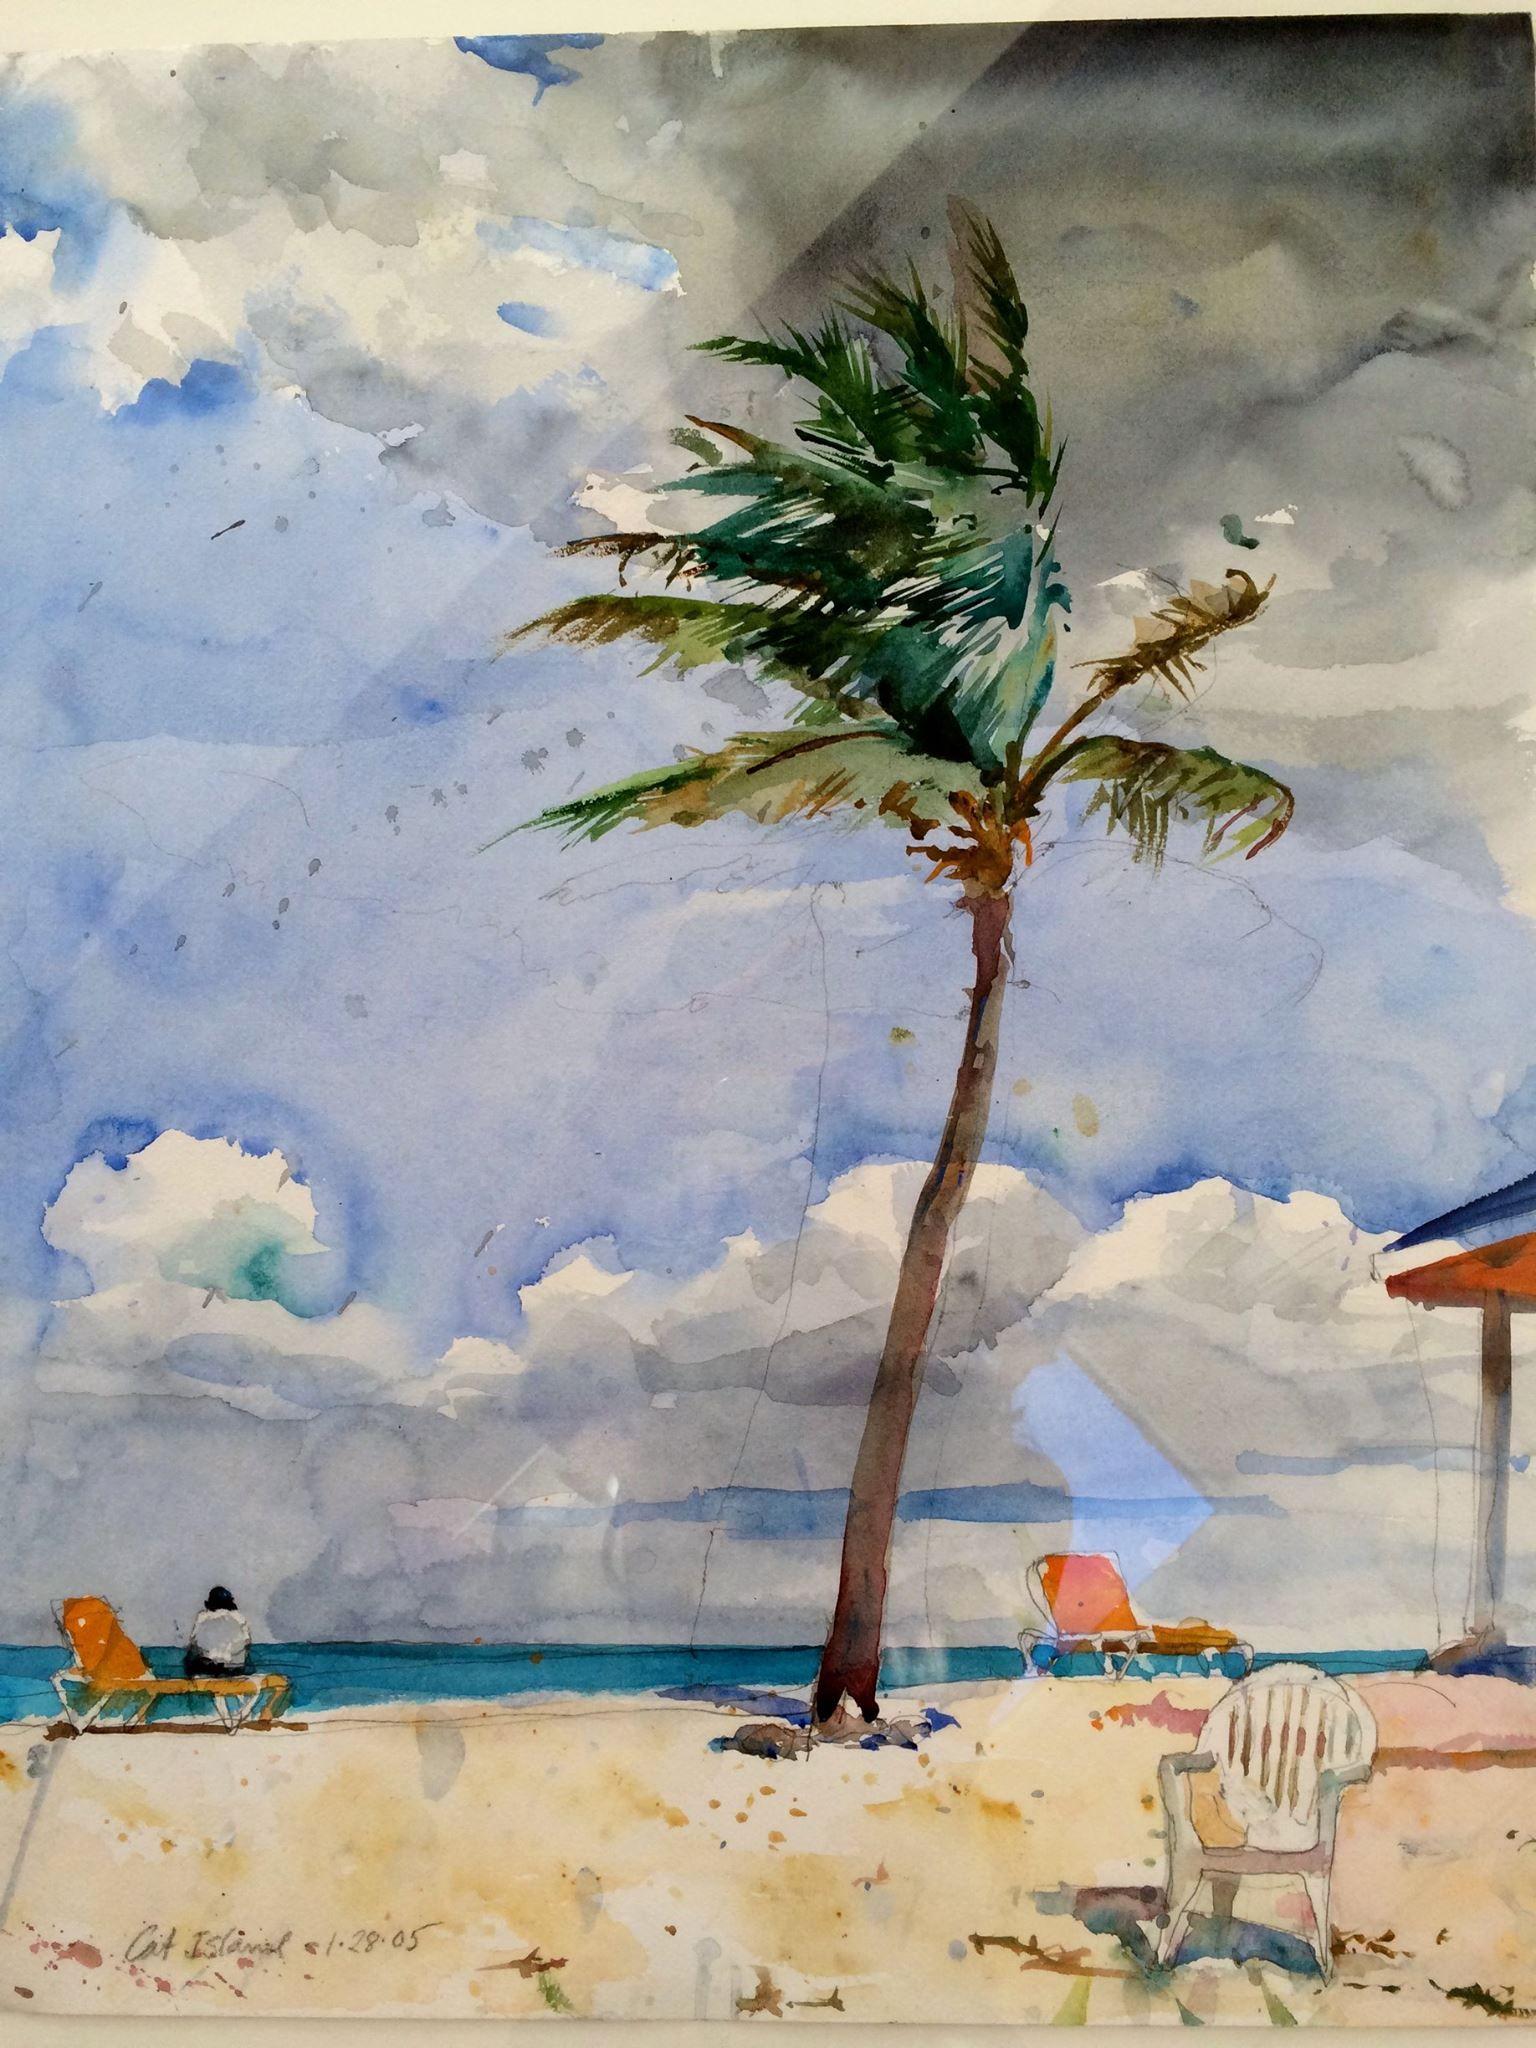 Watercolor artist magazine palm coast fl - Charles Reid Art